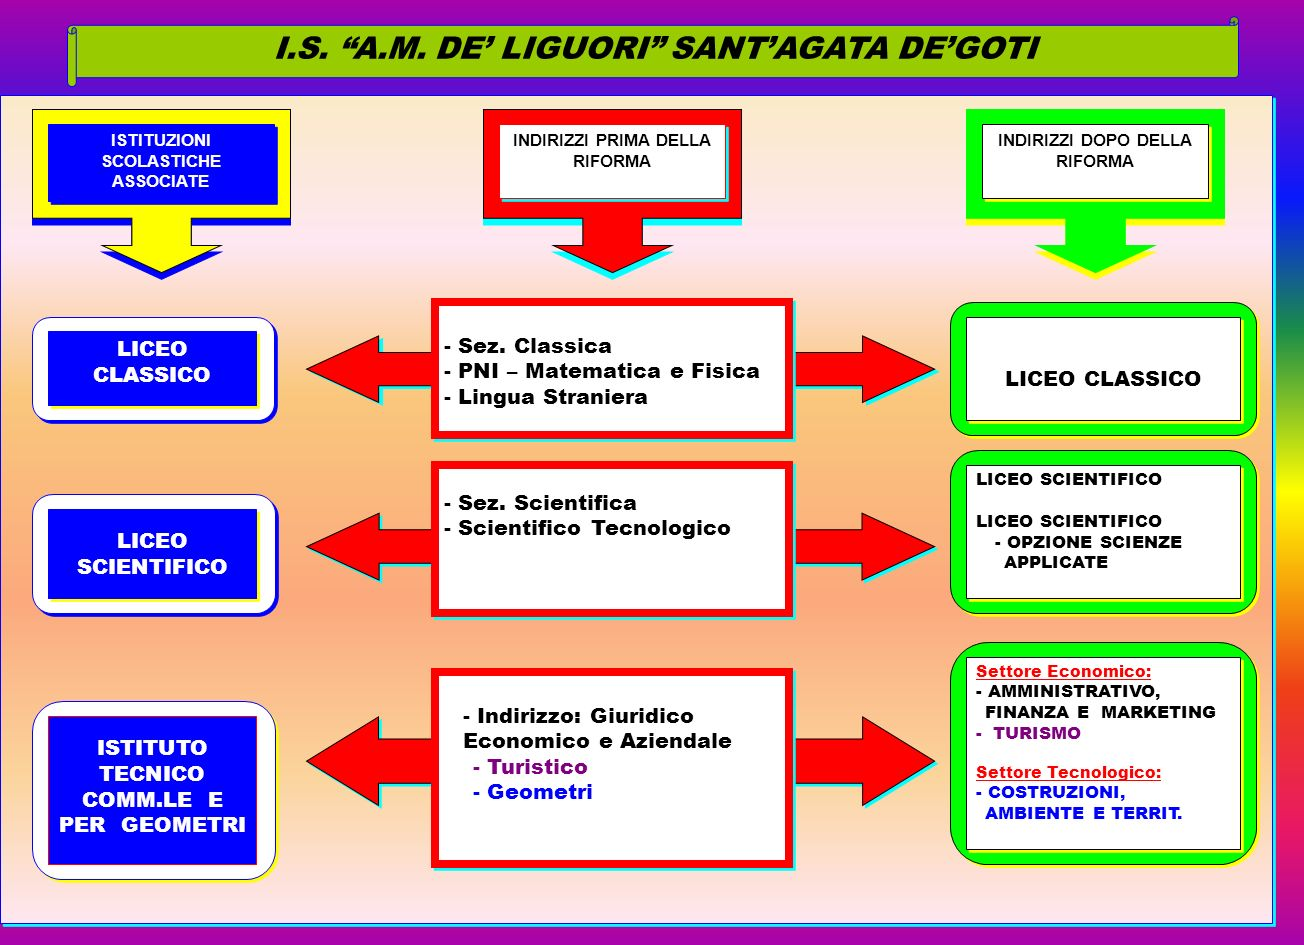 I.S. A.M. DE' LIGUORI SANT'AGATA DE'GOTI